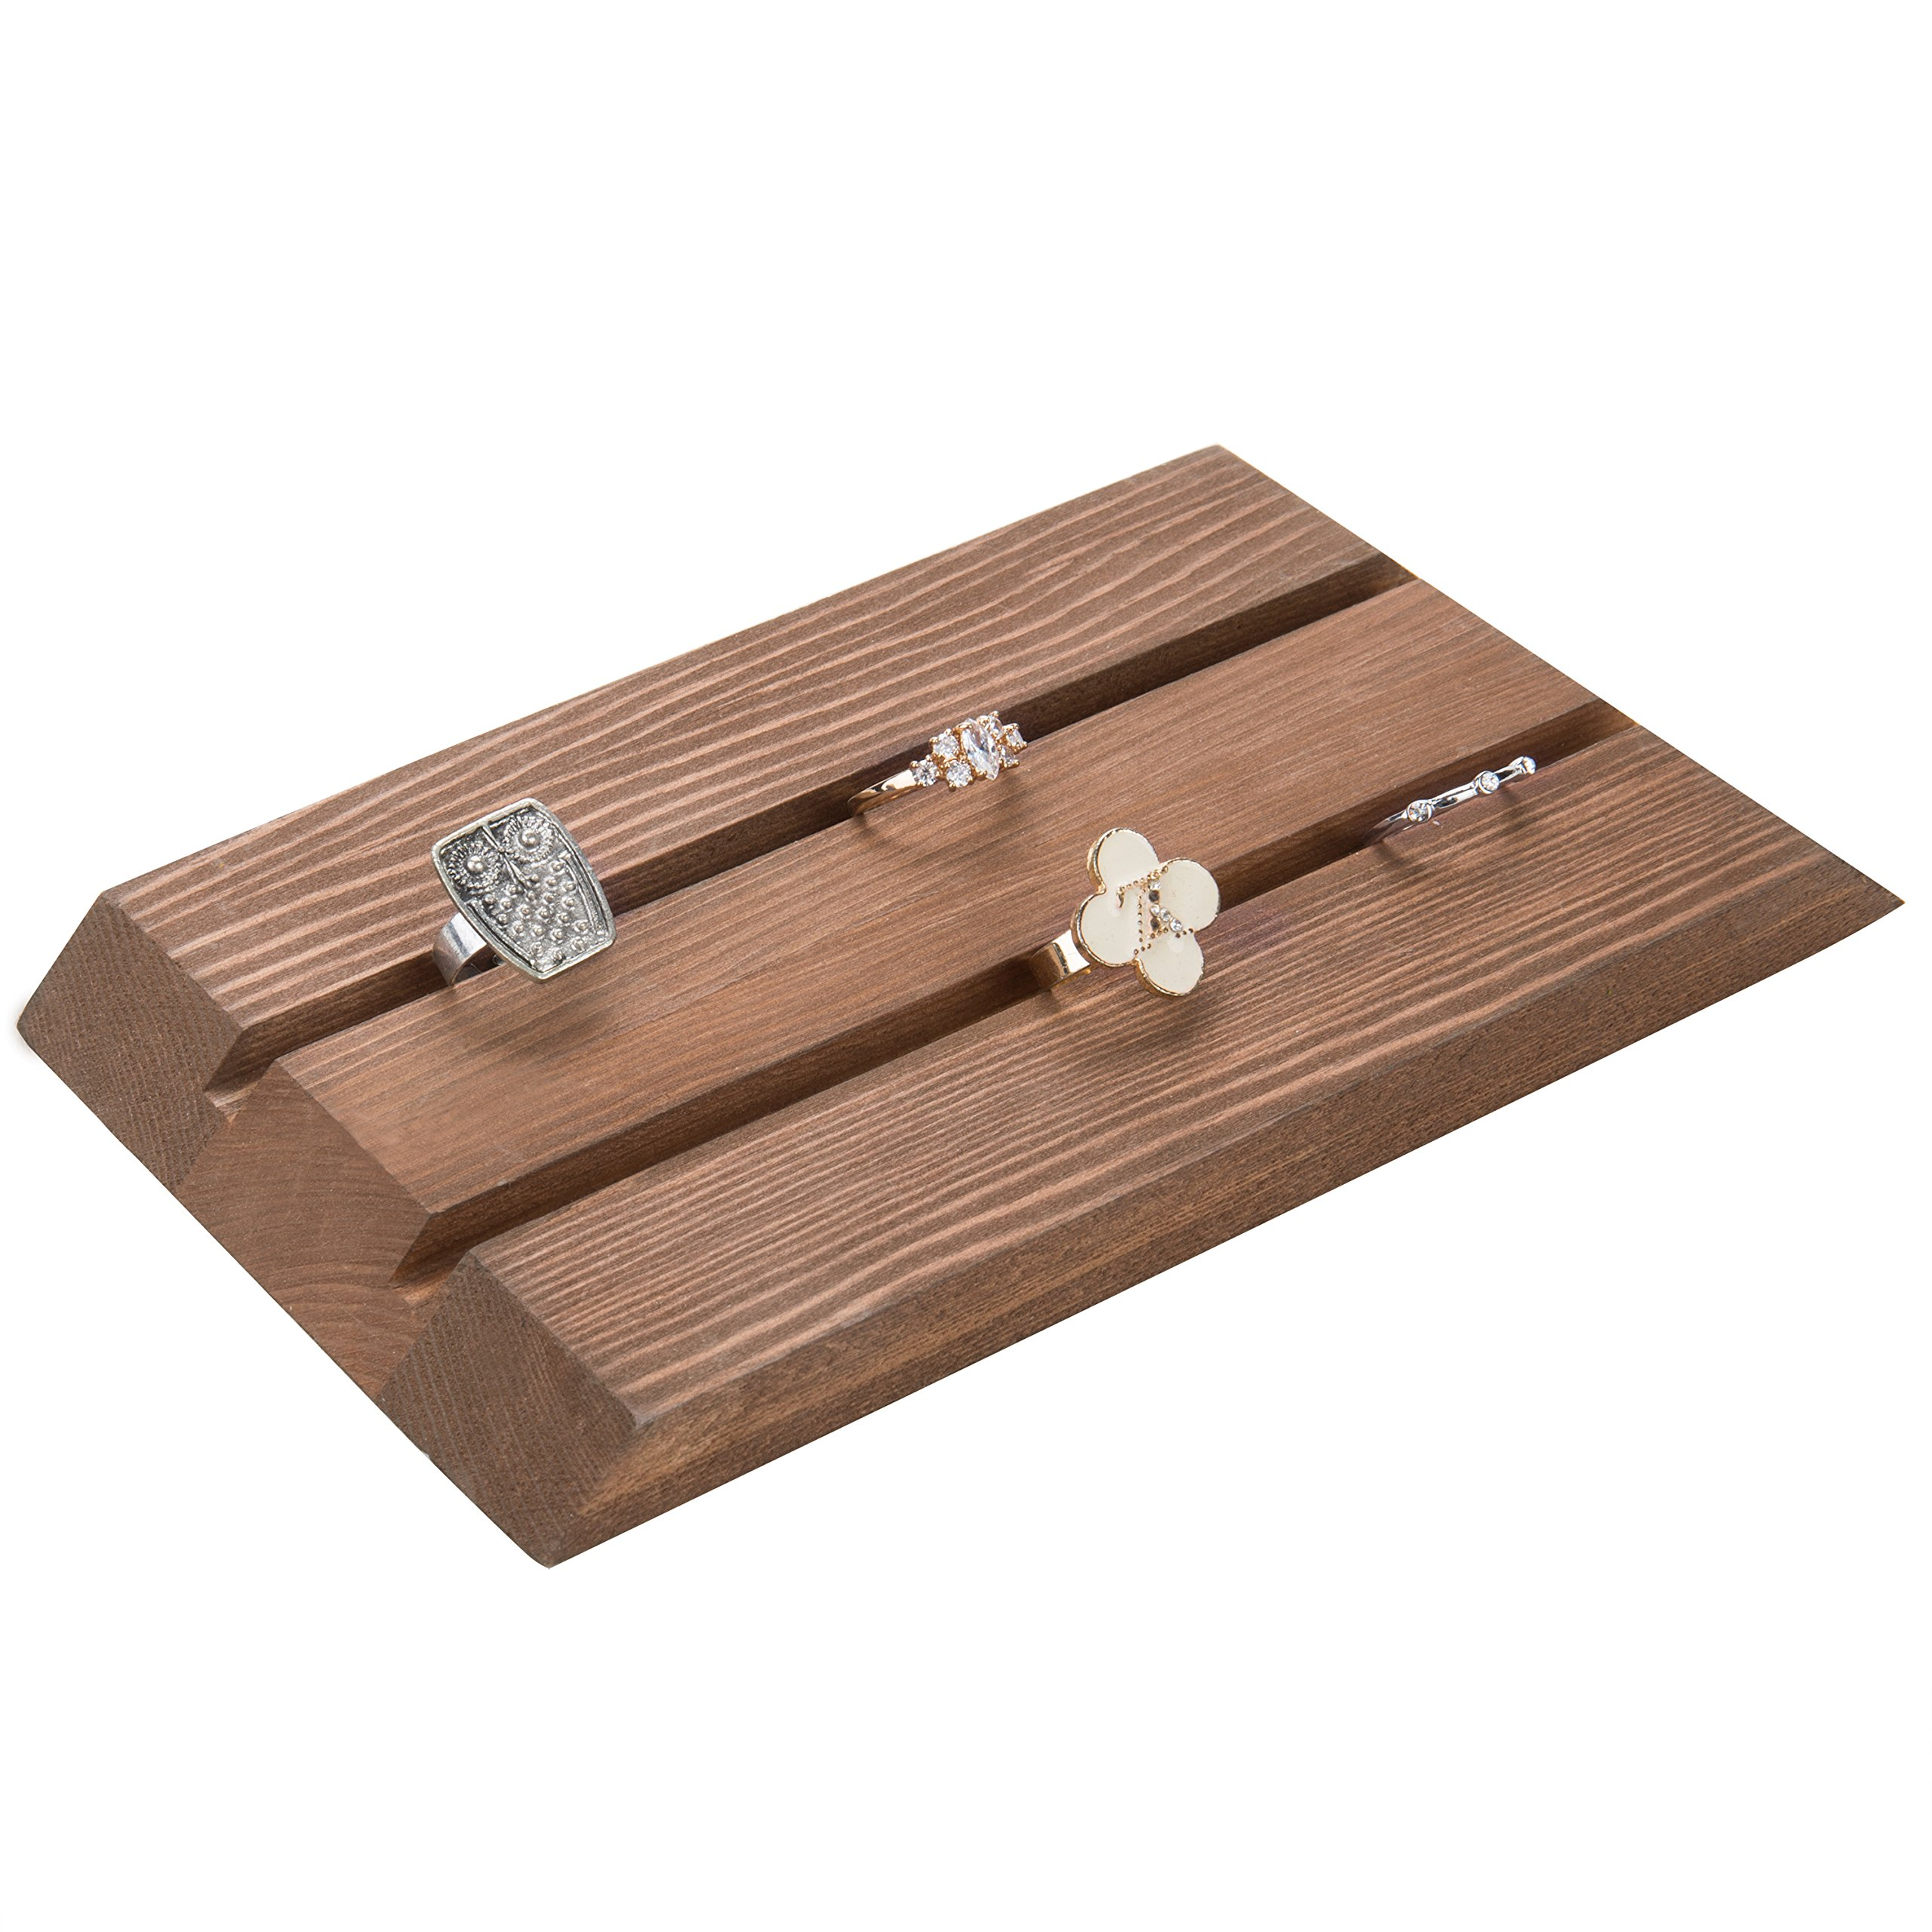 MyGift Rustic Wood Ring Tray Display Board